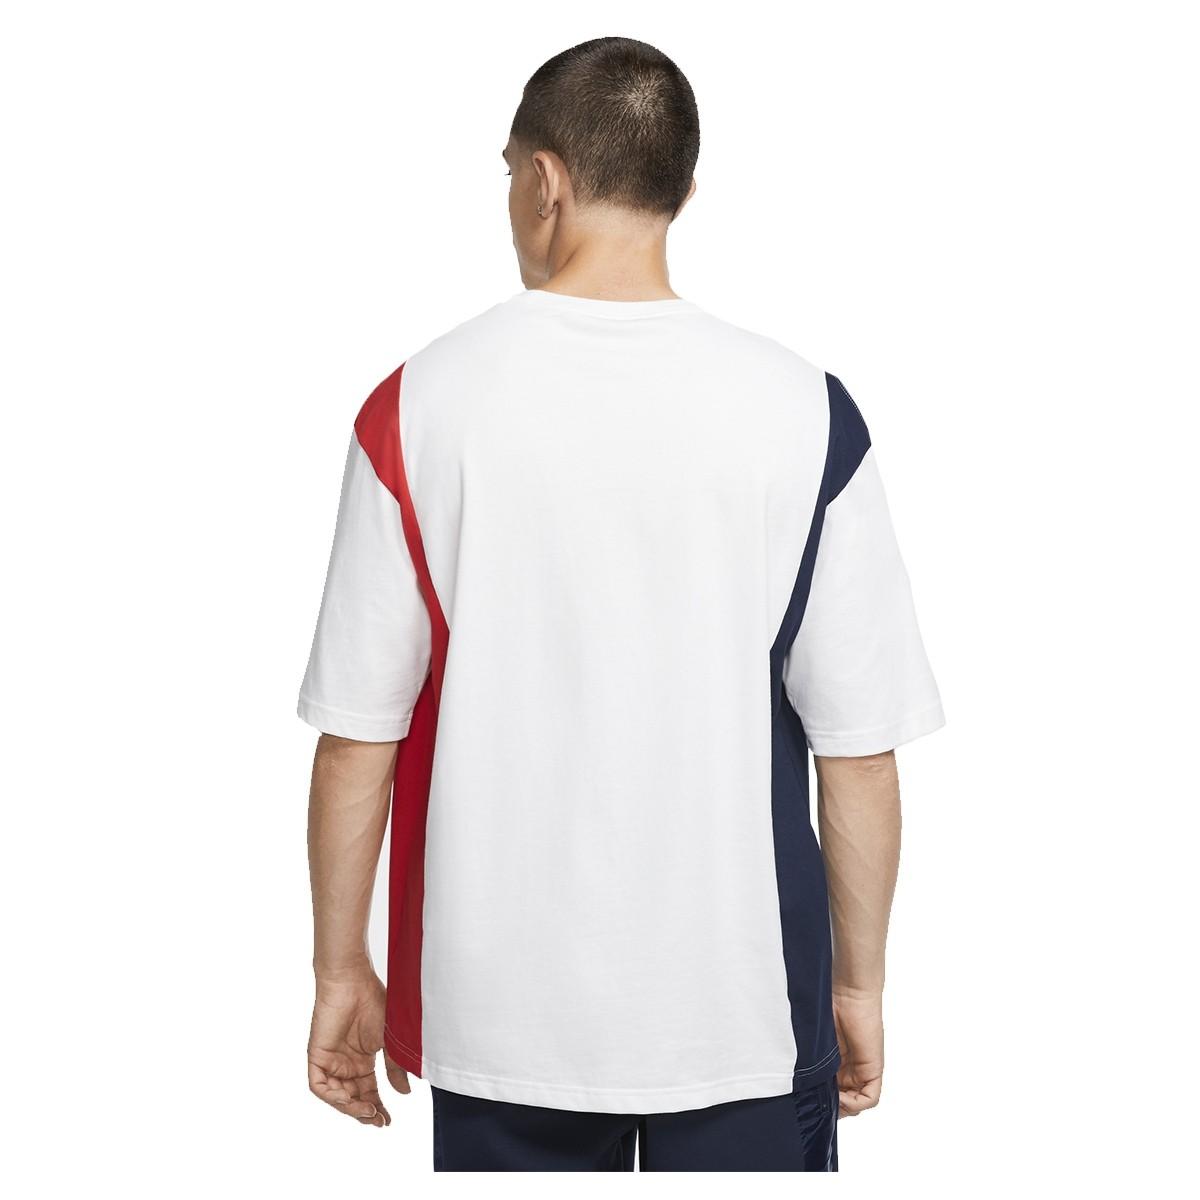 Francia Jordan Tee 'White'-CT2188-100